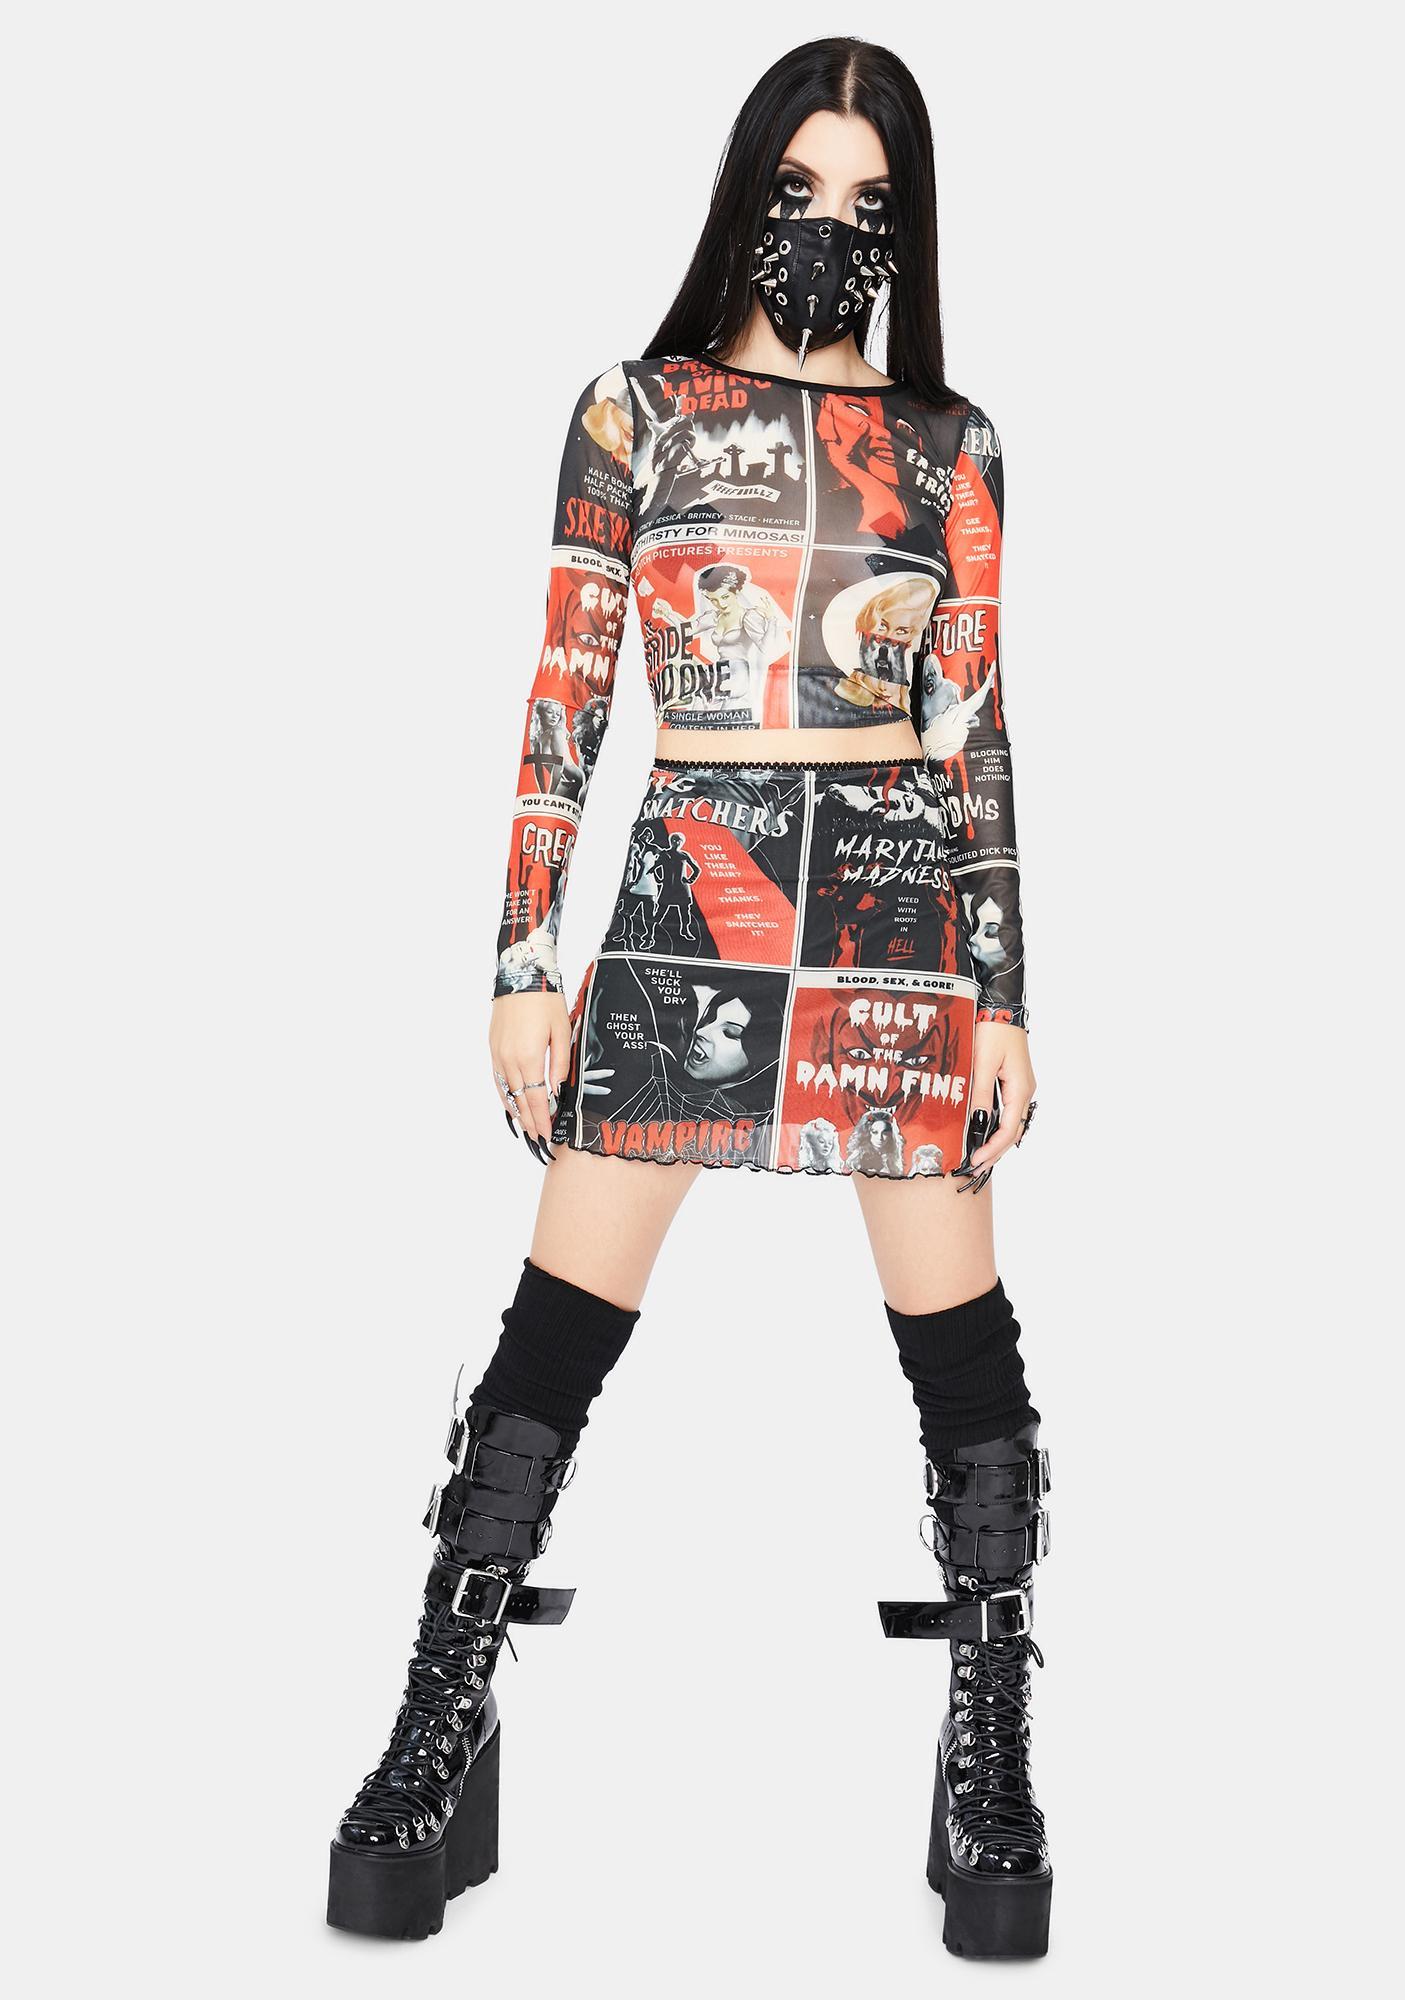 Dolls Kill Fears On Film Mesh Skirt